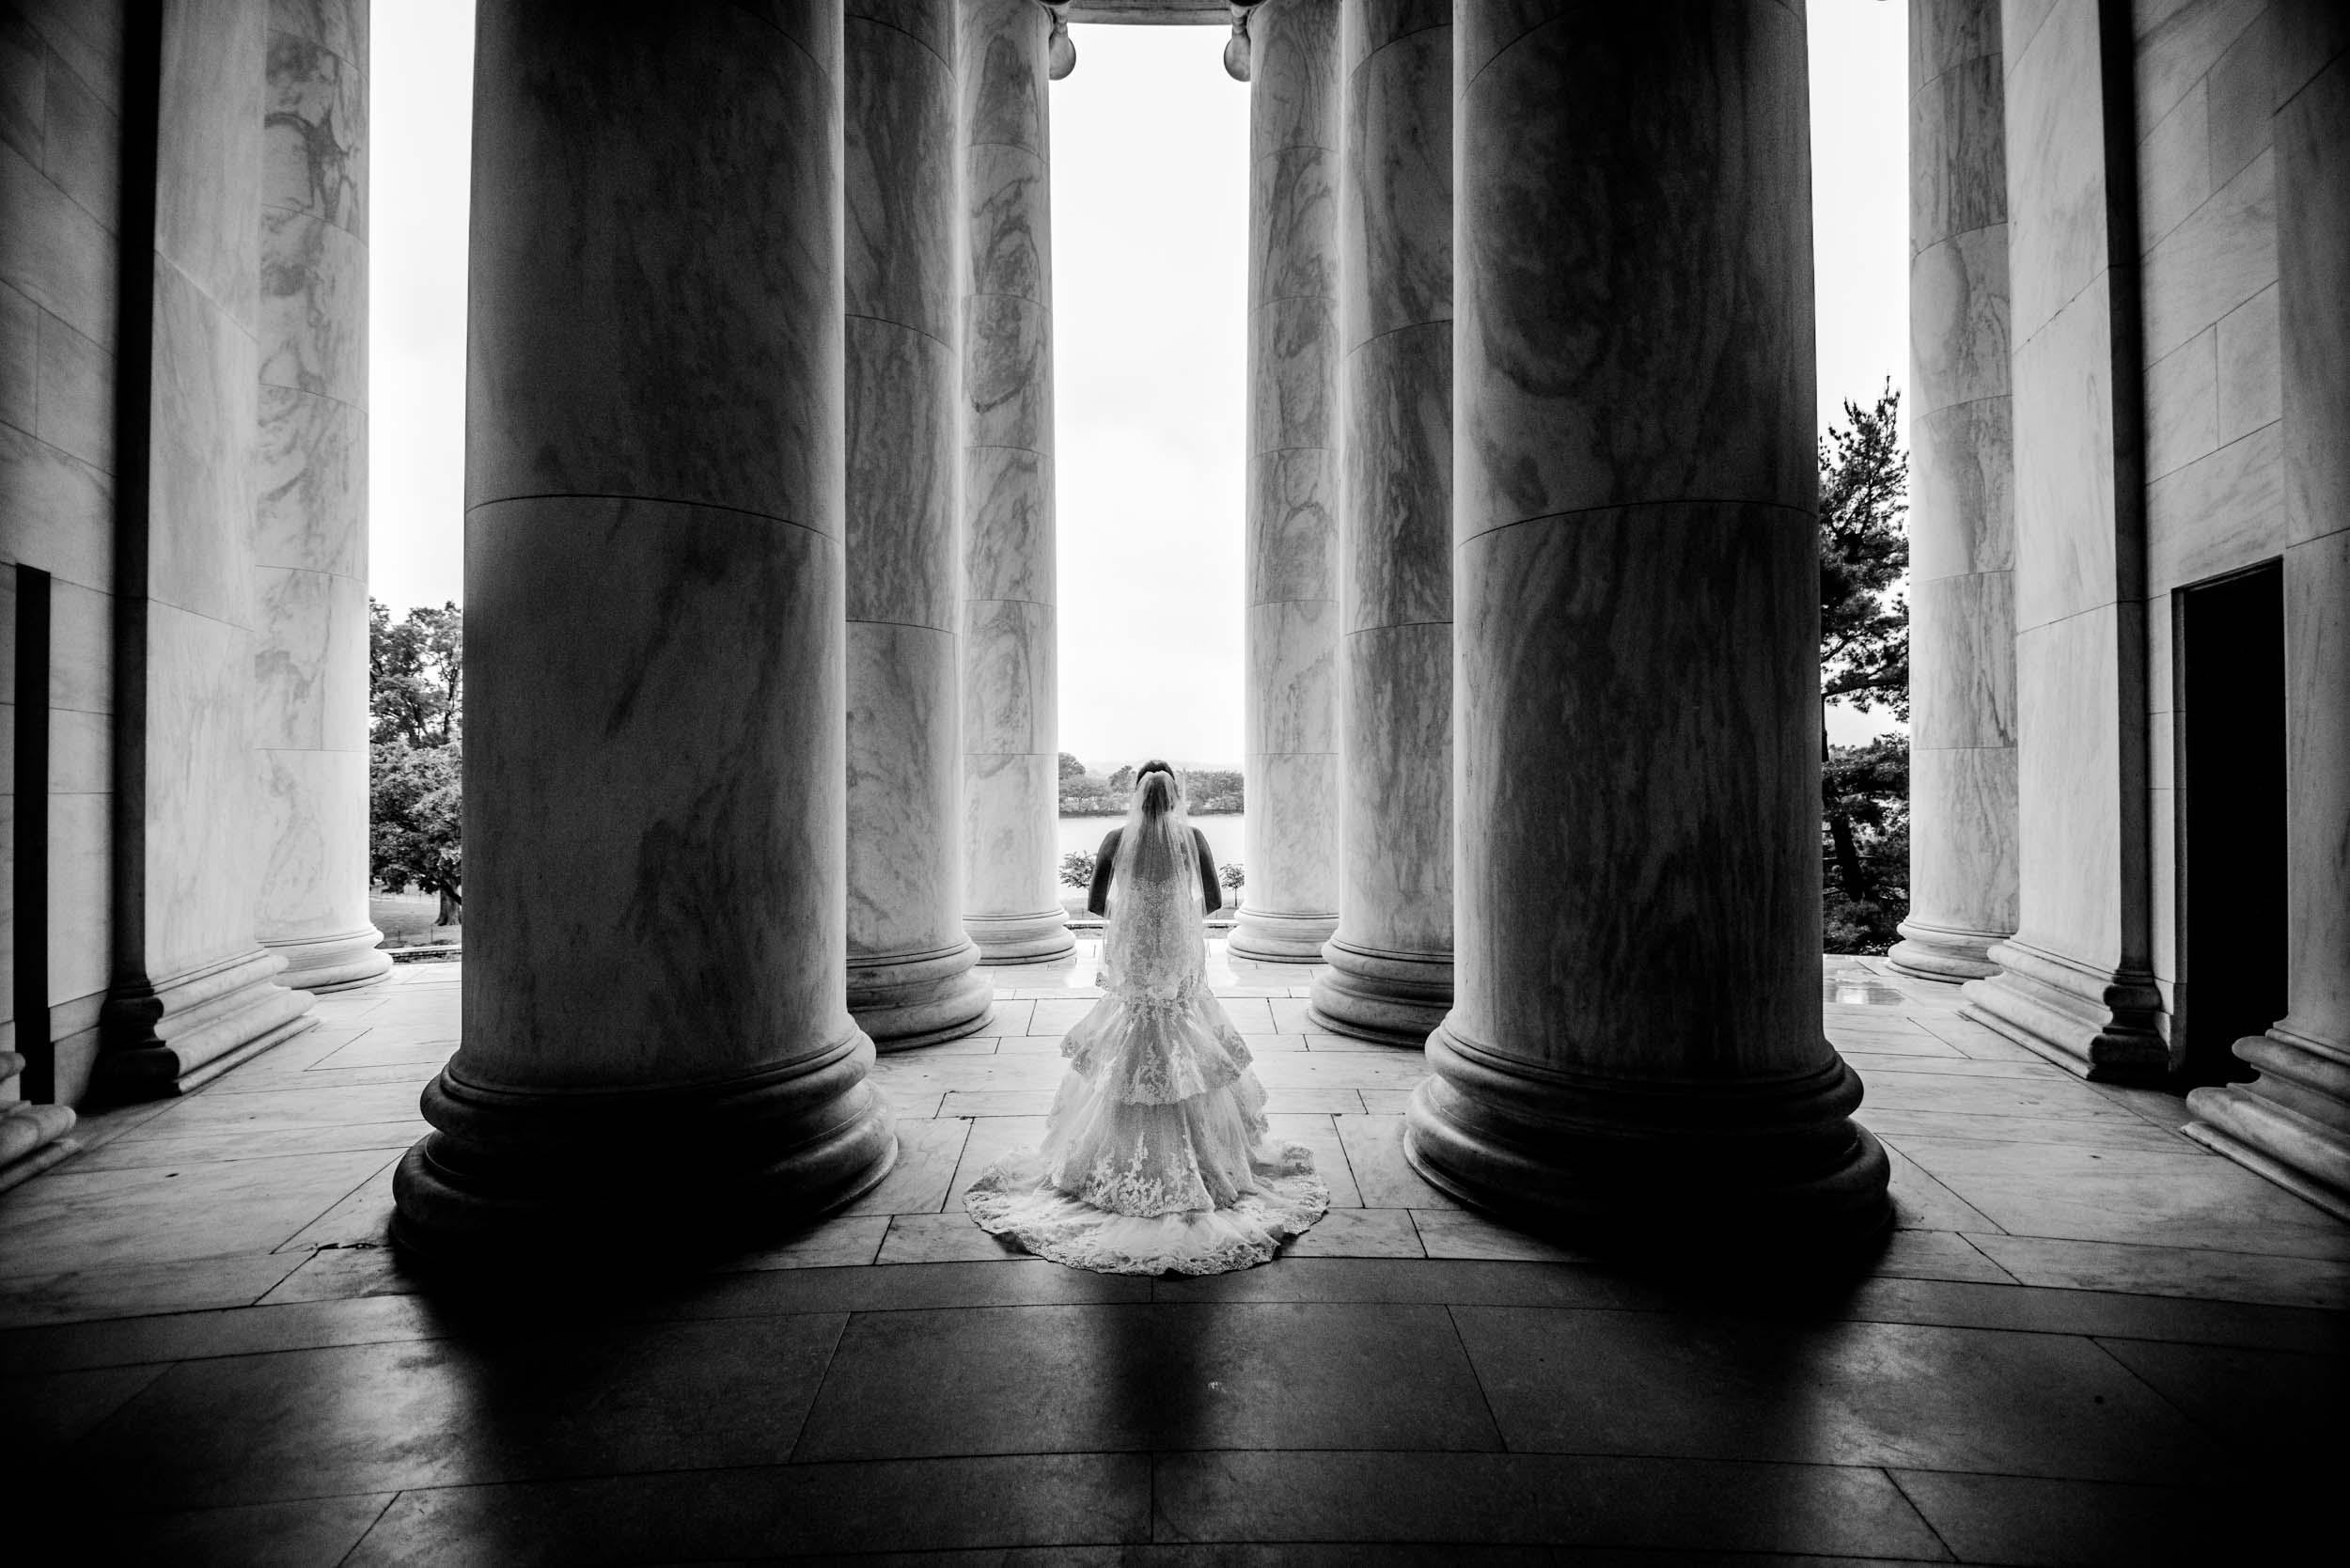 dc+metro+wedding+photographer+vadym+guliuk+photography+wedding+bride-2025.jpg